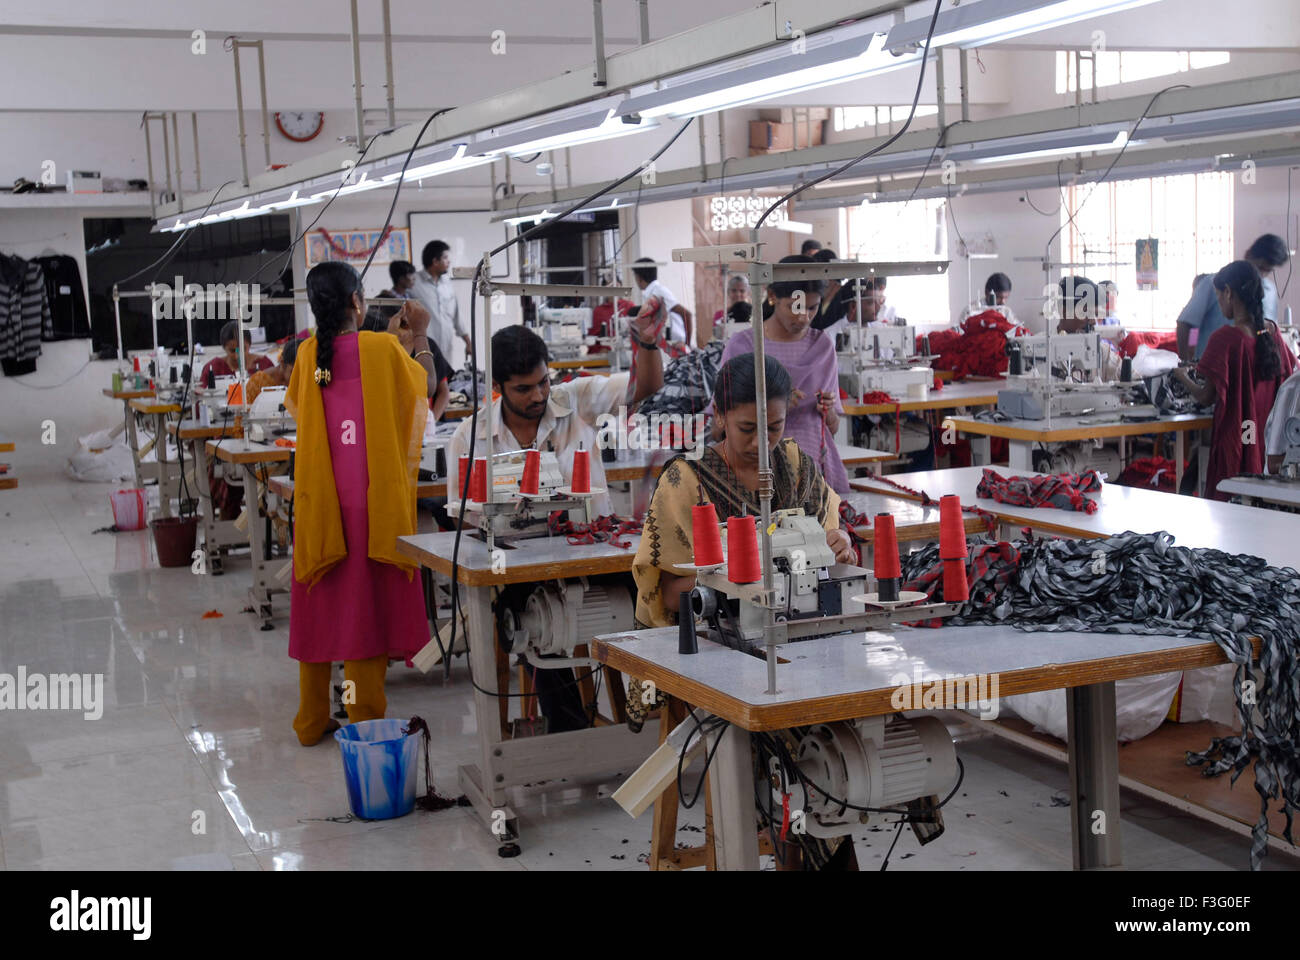 Knitting Units In Tirupur : Stitching in a garment industry tirupur tamil nadu